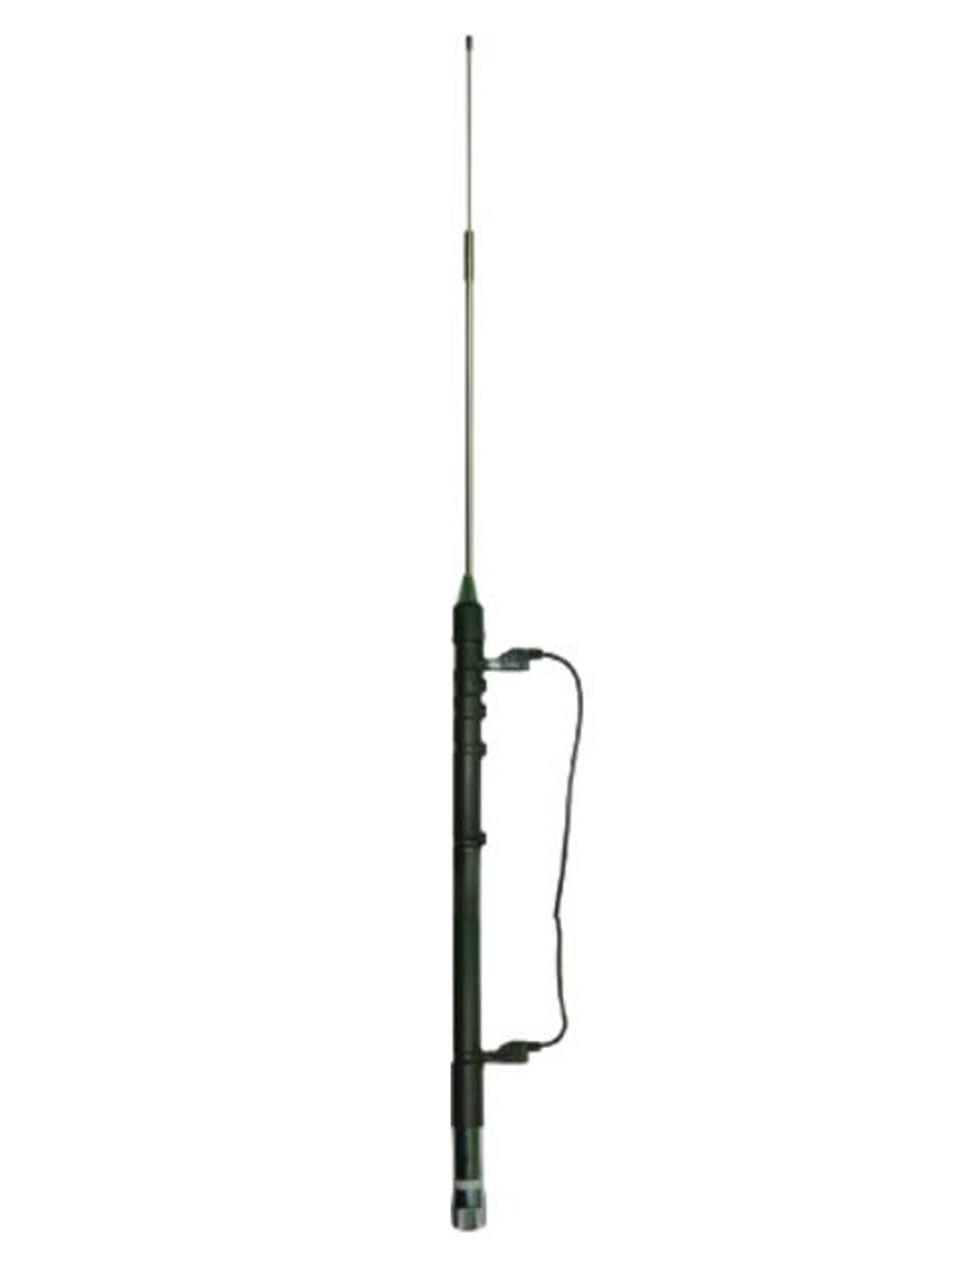 OPEK HVT-400B - 8 Band High Performance HF VHF UHF Ham Radio Antenna